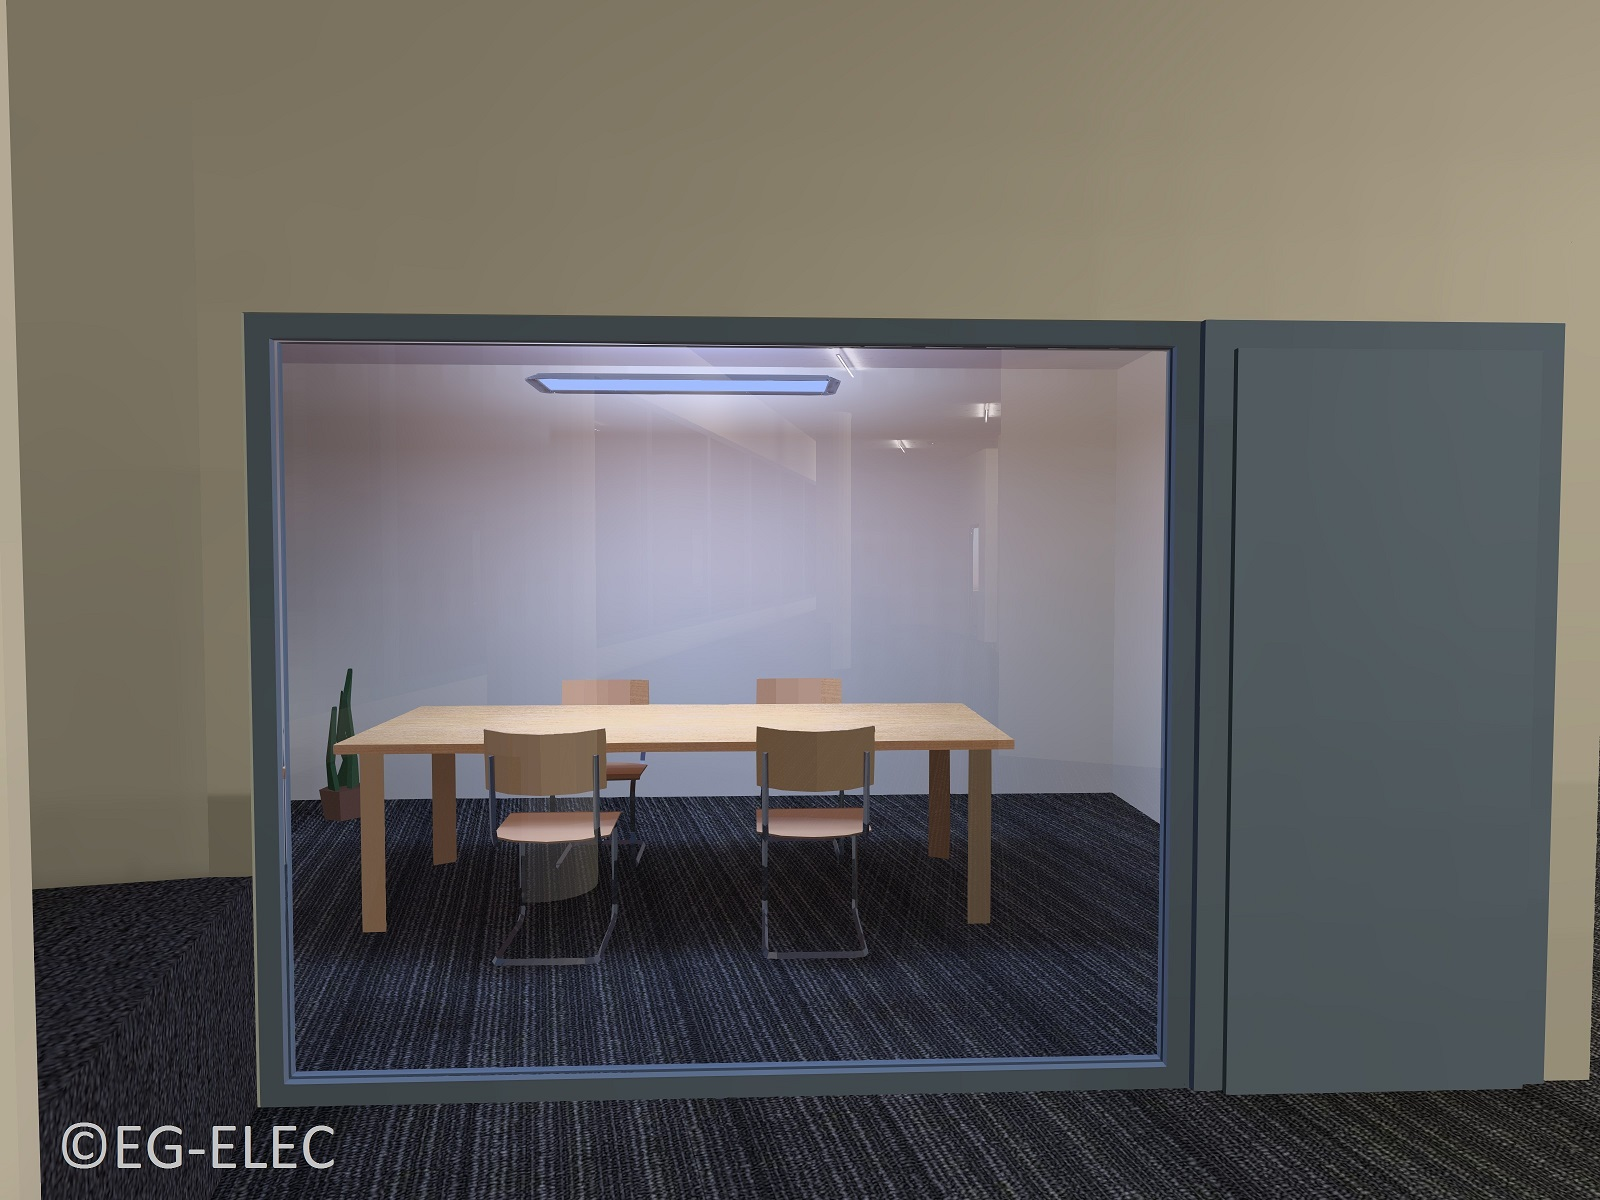 Productiehuis – De Mensen – Vergaderruimte 2 – 02©